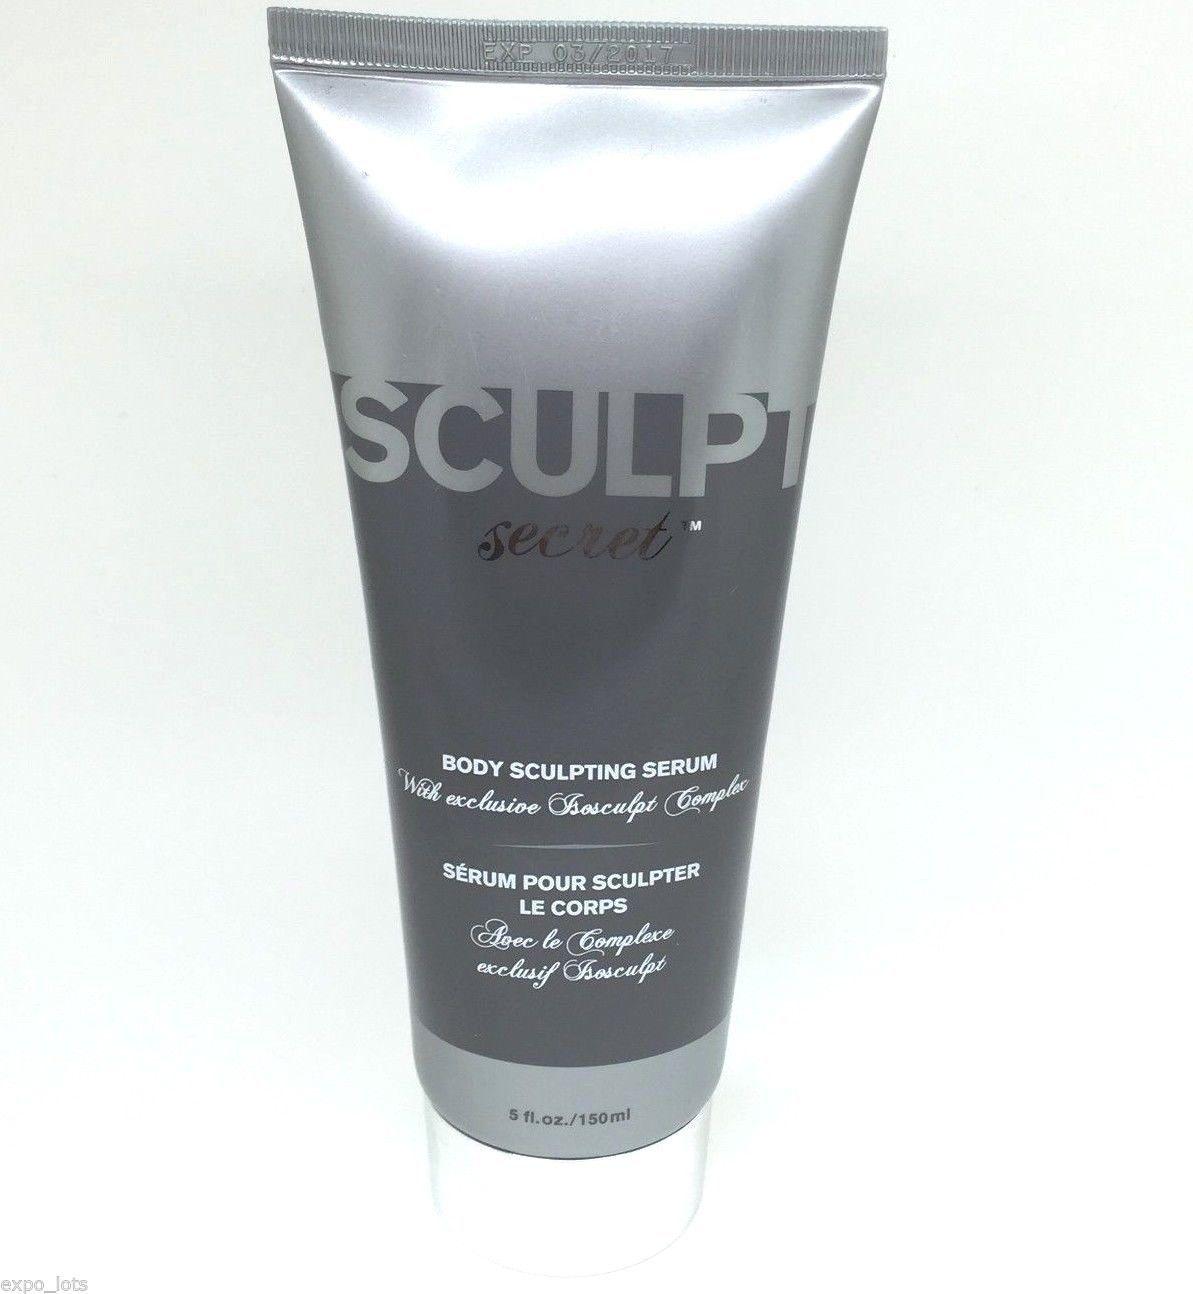 SCULPT-SECRET-BODY-SCULPTING-SERUM